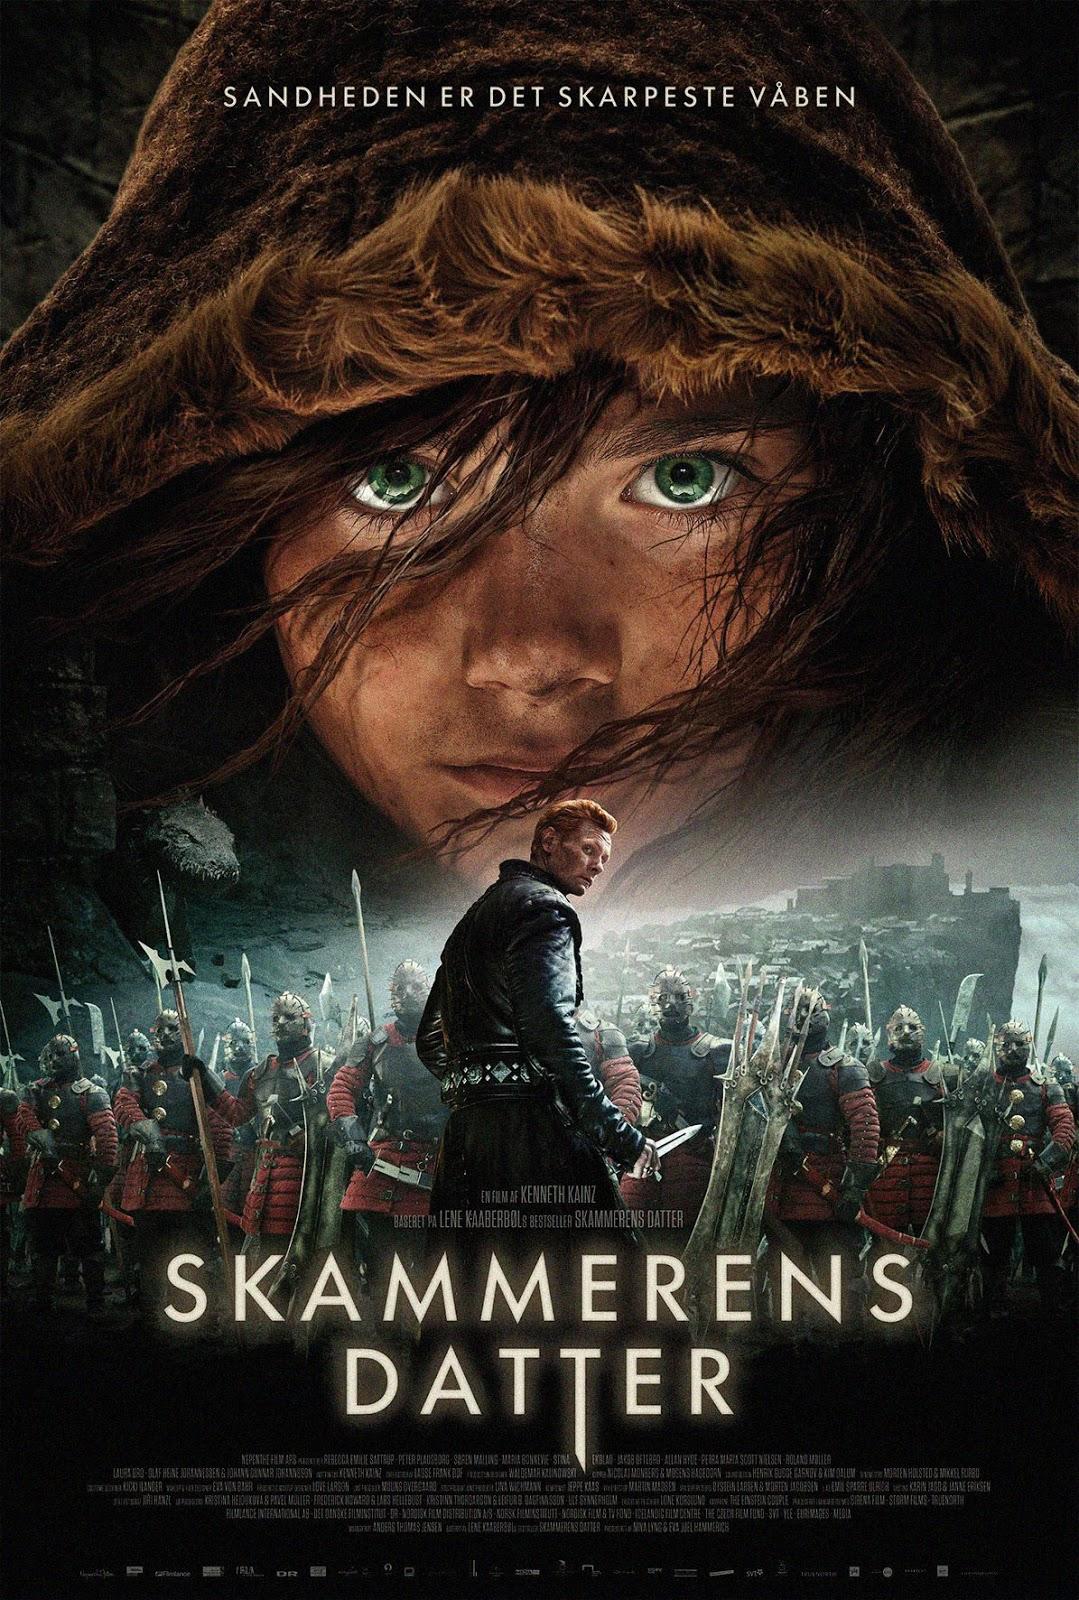 The Shamer's Daughter (2015) สาวน้อยพลังเวทย์ กับดินแดนมังกรไฟ HD  [ภาพ Master พร้อมโรง]